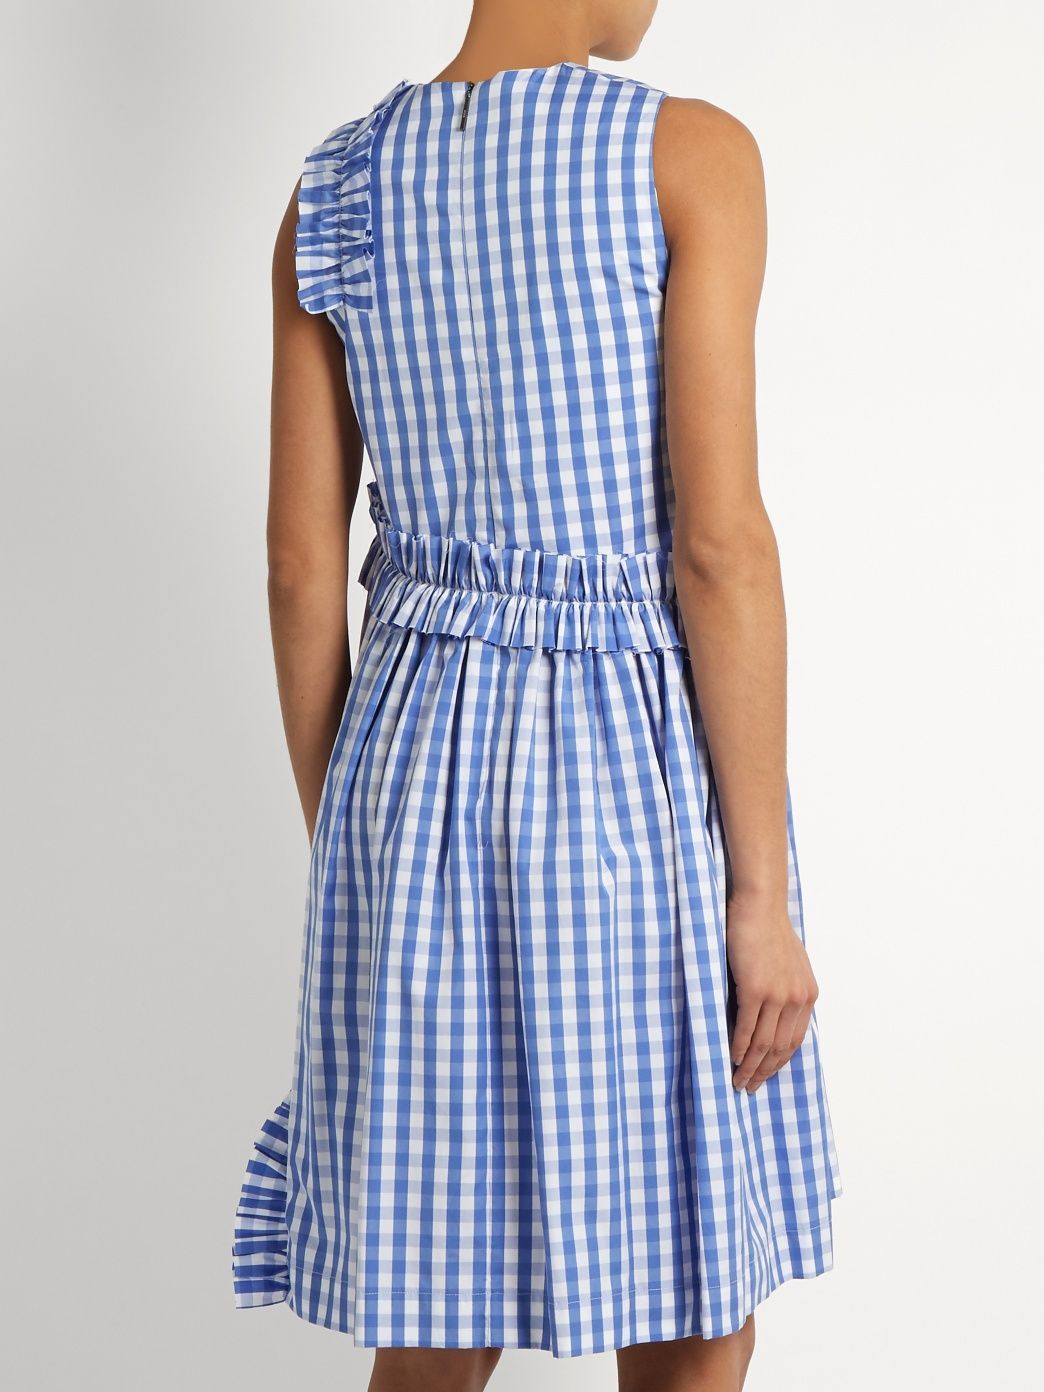 83c074fdc1b227 Sleeveless ruffle-trimmed cotton-gingham dress